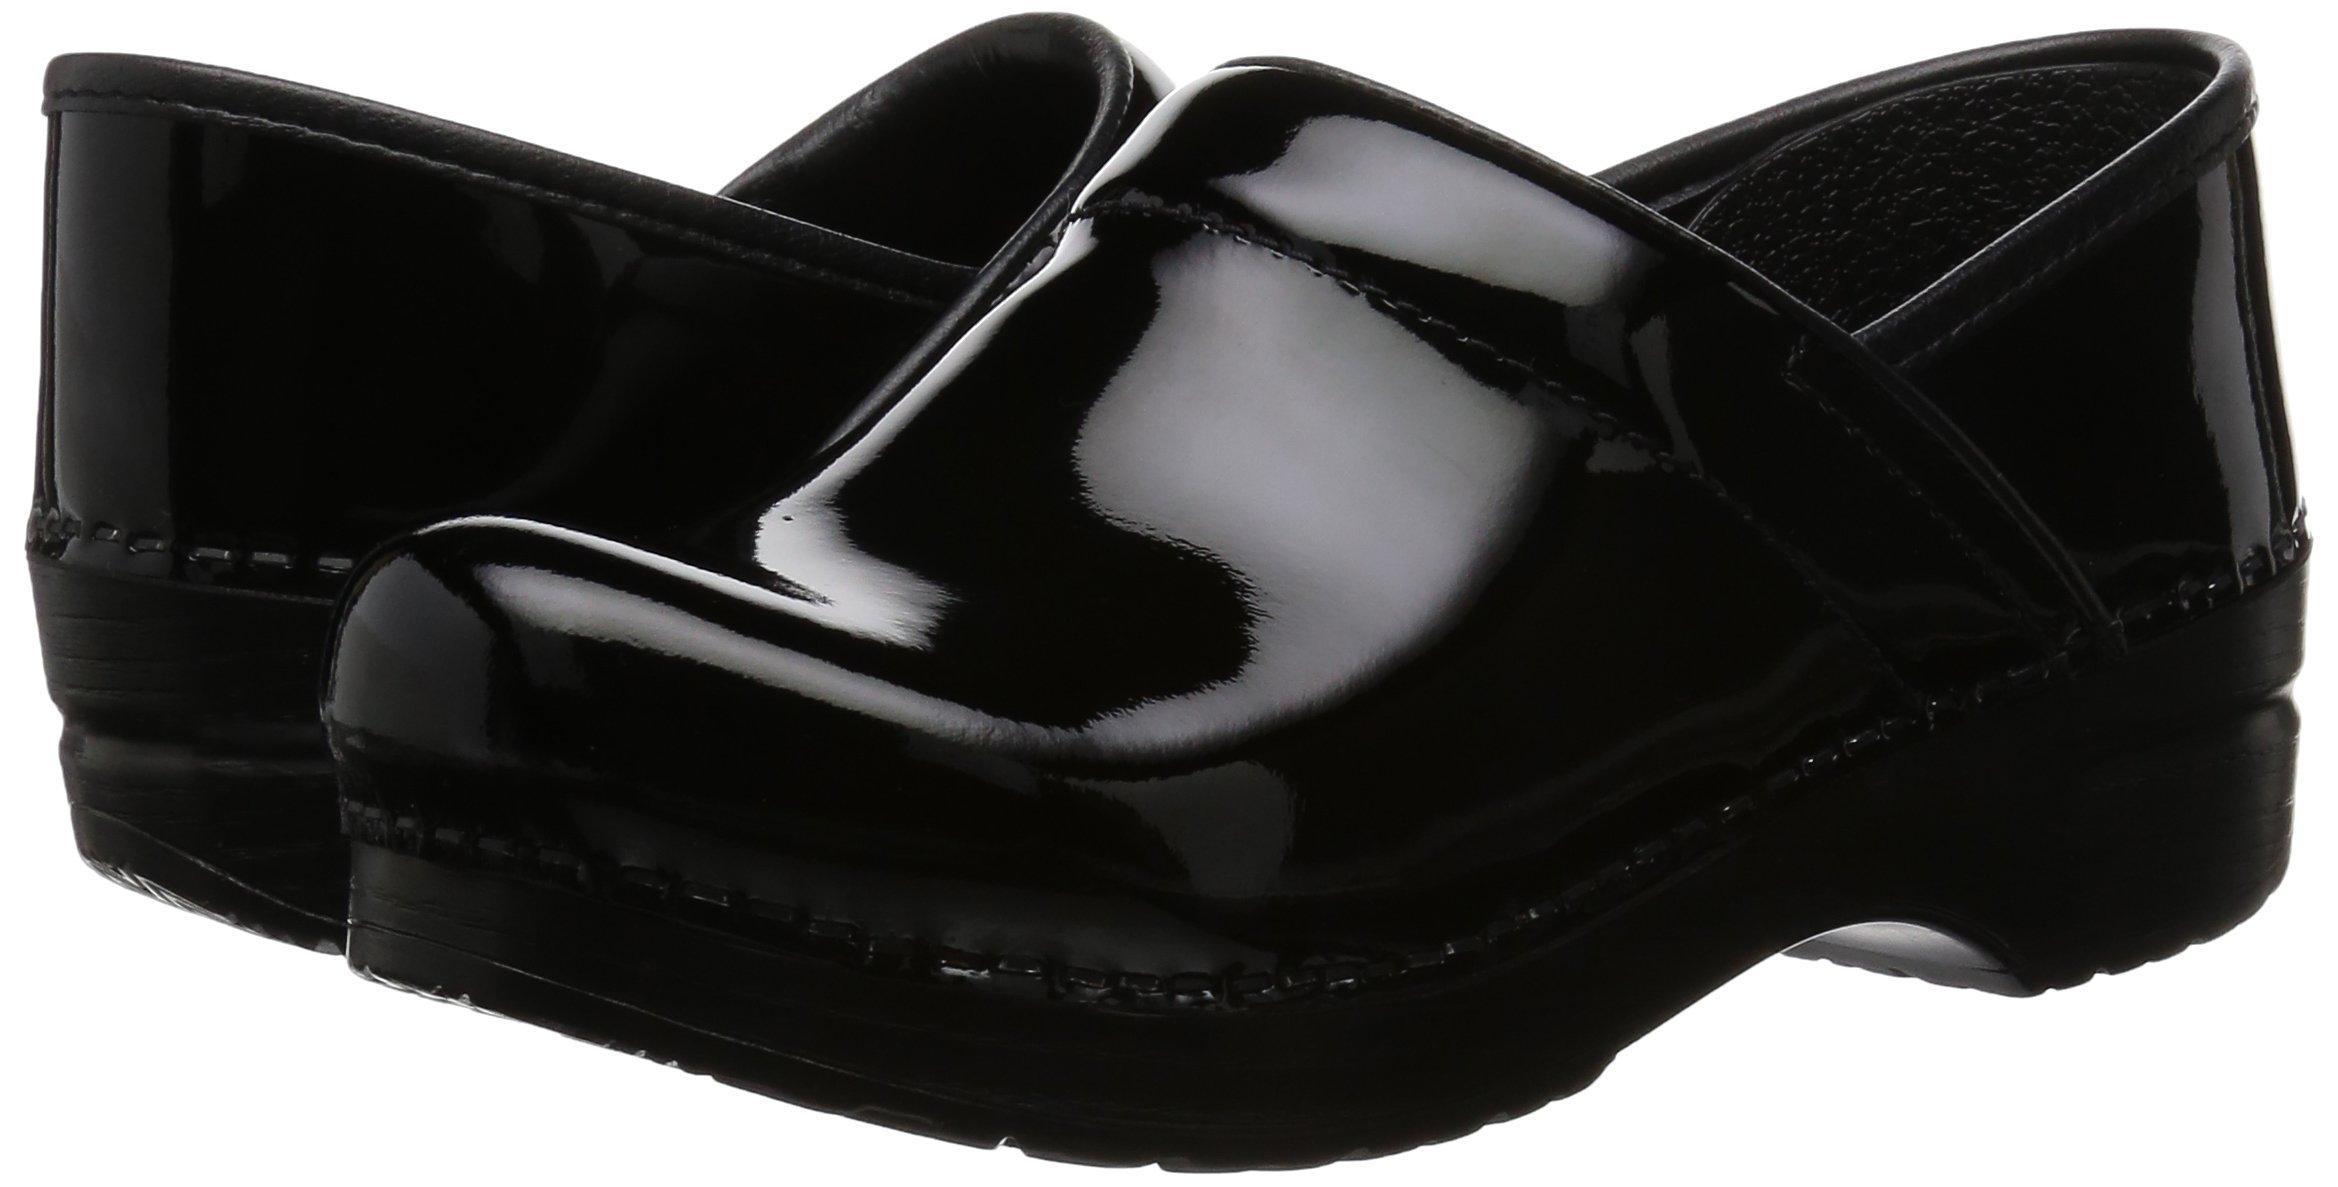 Dansko Women's Professional Patent Leather Clog,Black Patent,37 EU / 6.5-7 B(M) US by Dansko (Image #6)